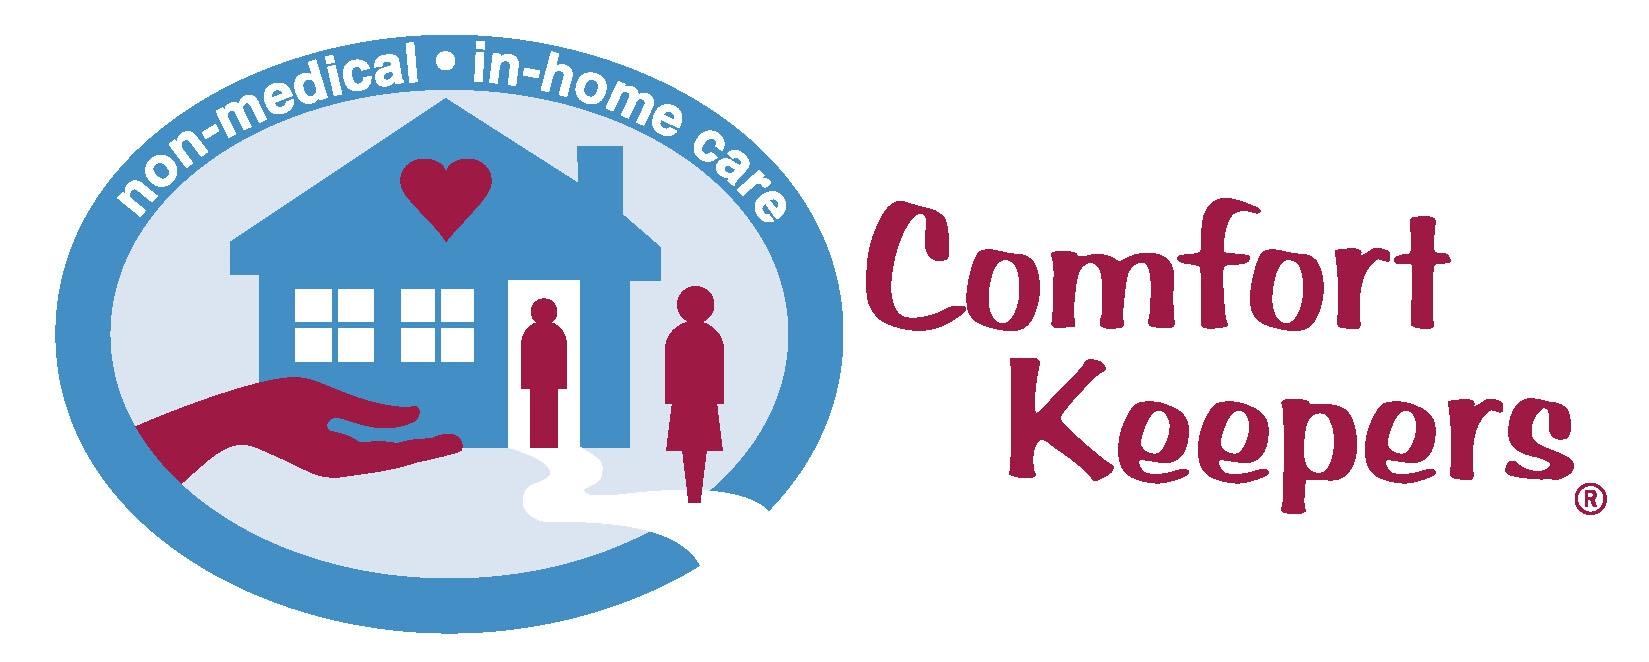 Comfort Keepers Logos